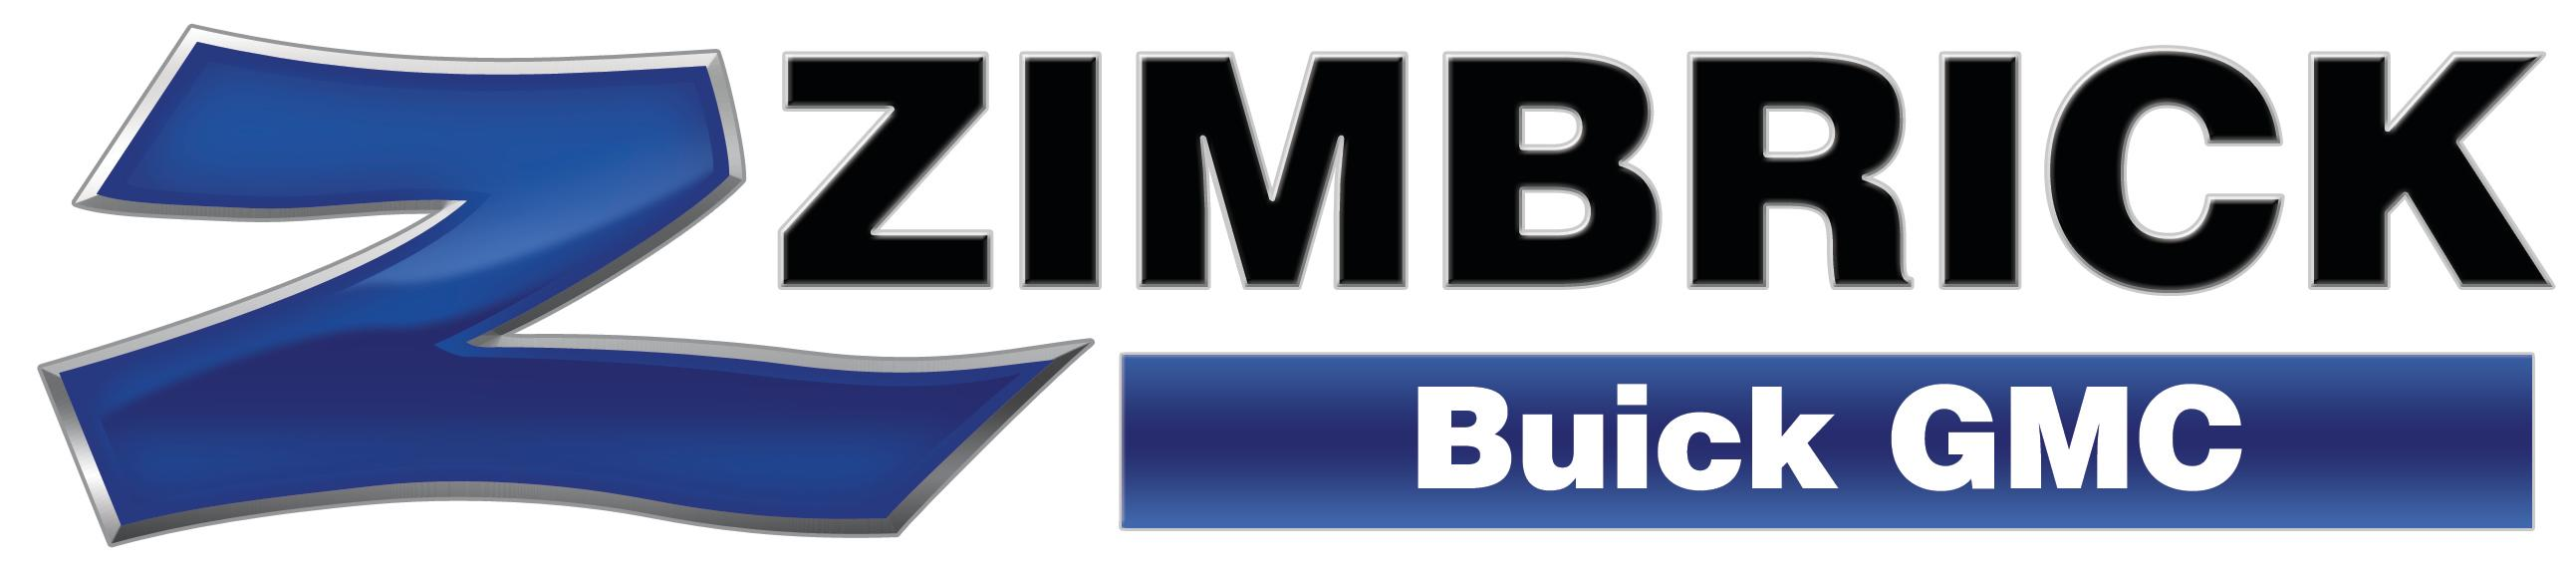 Zimbrick Buick GMC Eastside image 1